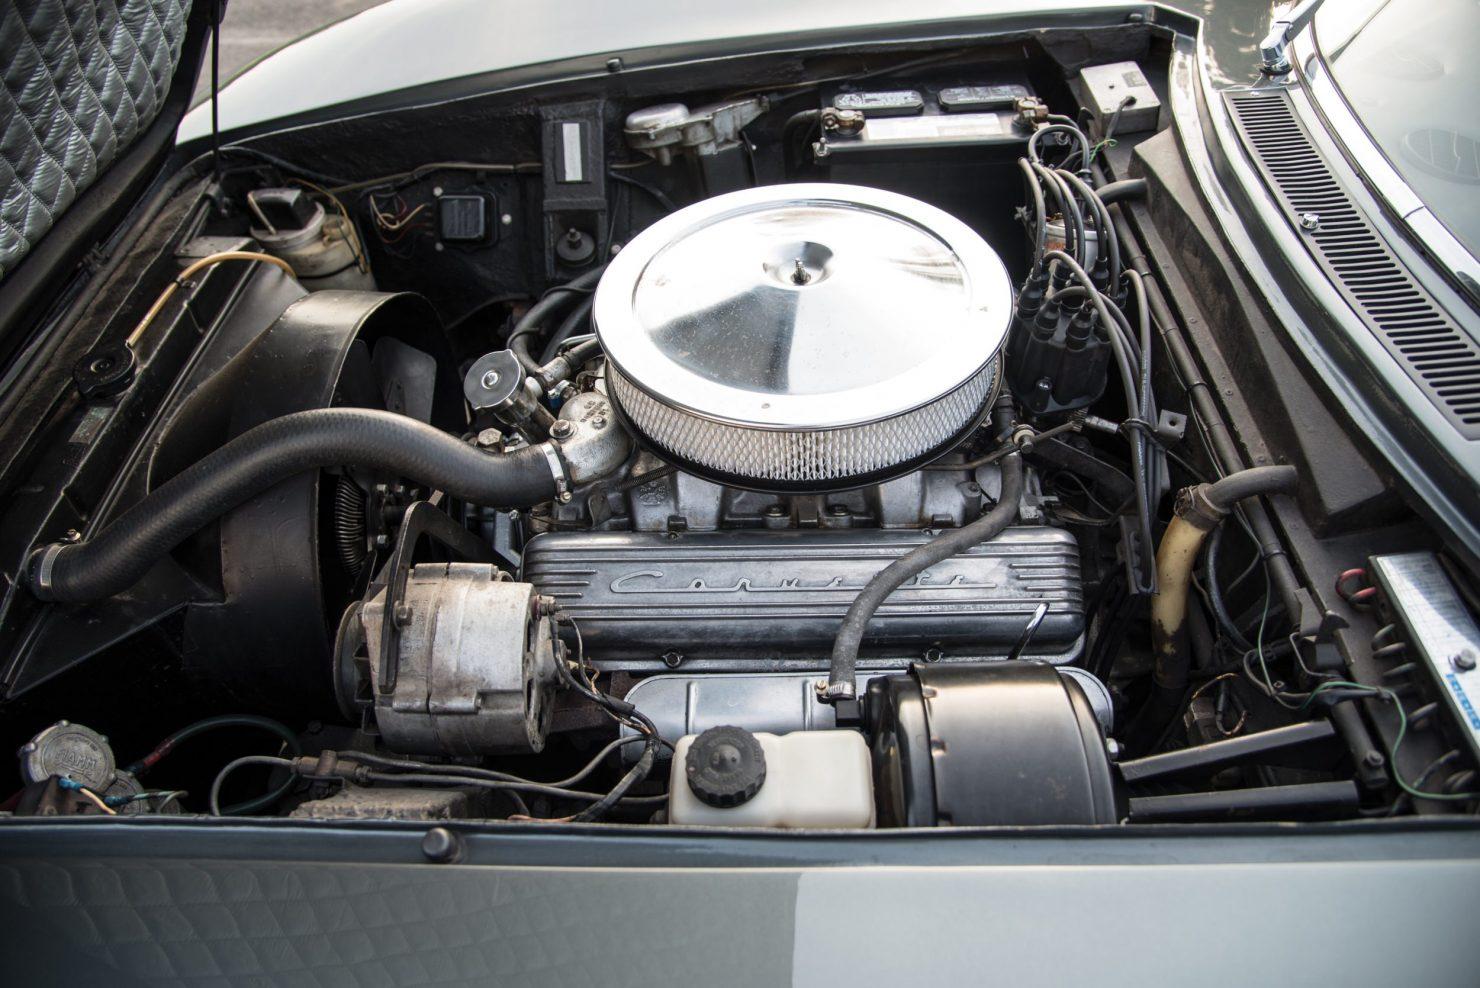 iso grifo car 3 1480x988 - 1966 Iso Grifo GL Series I